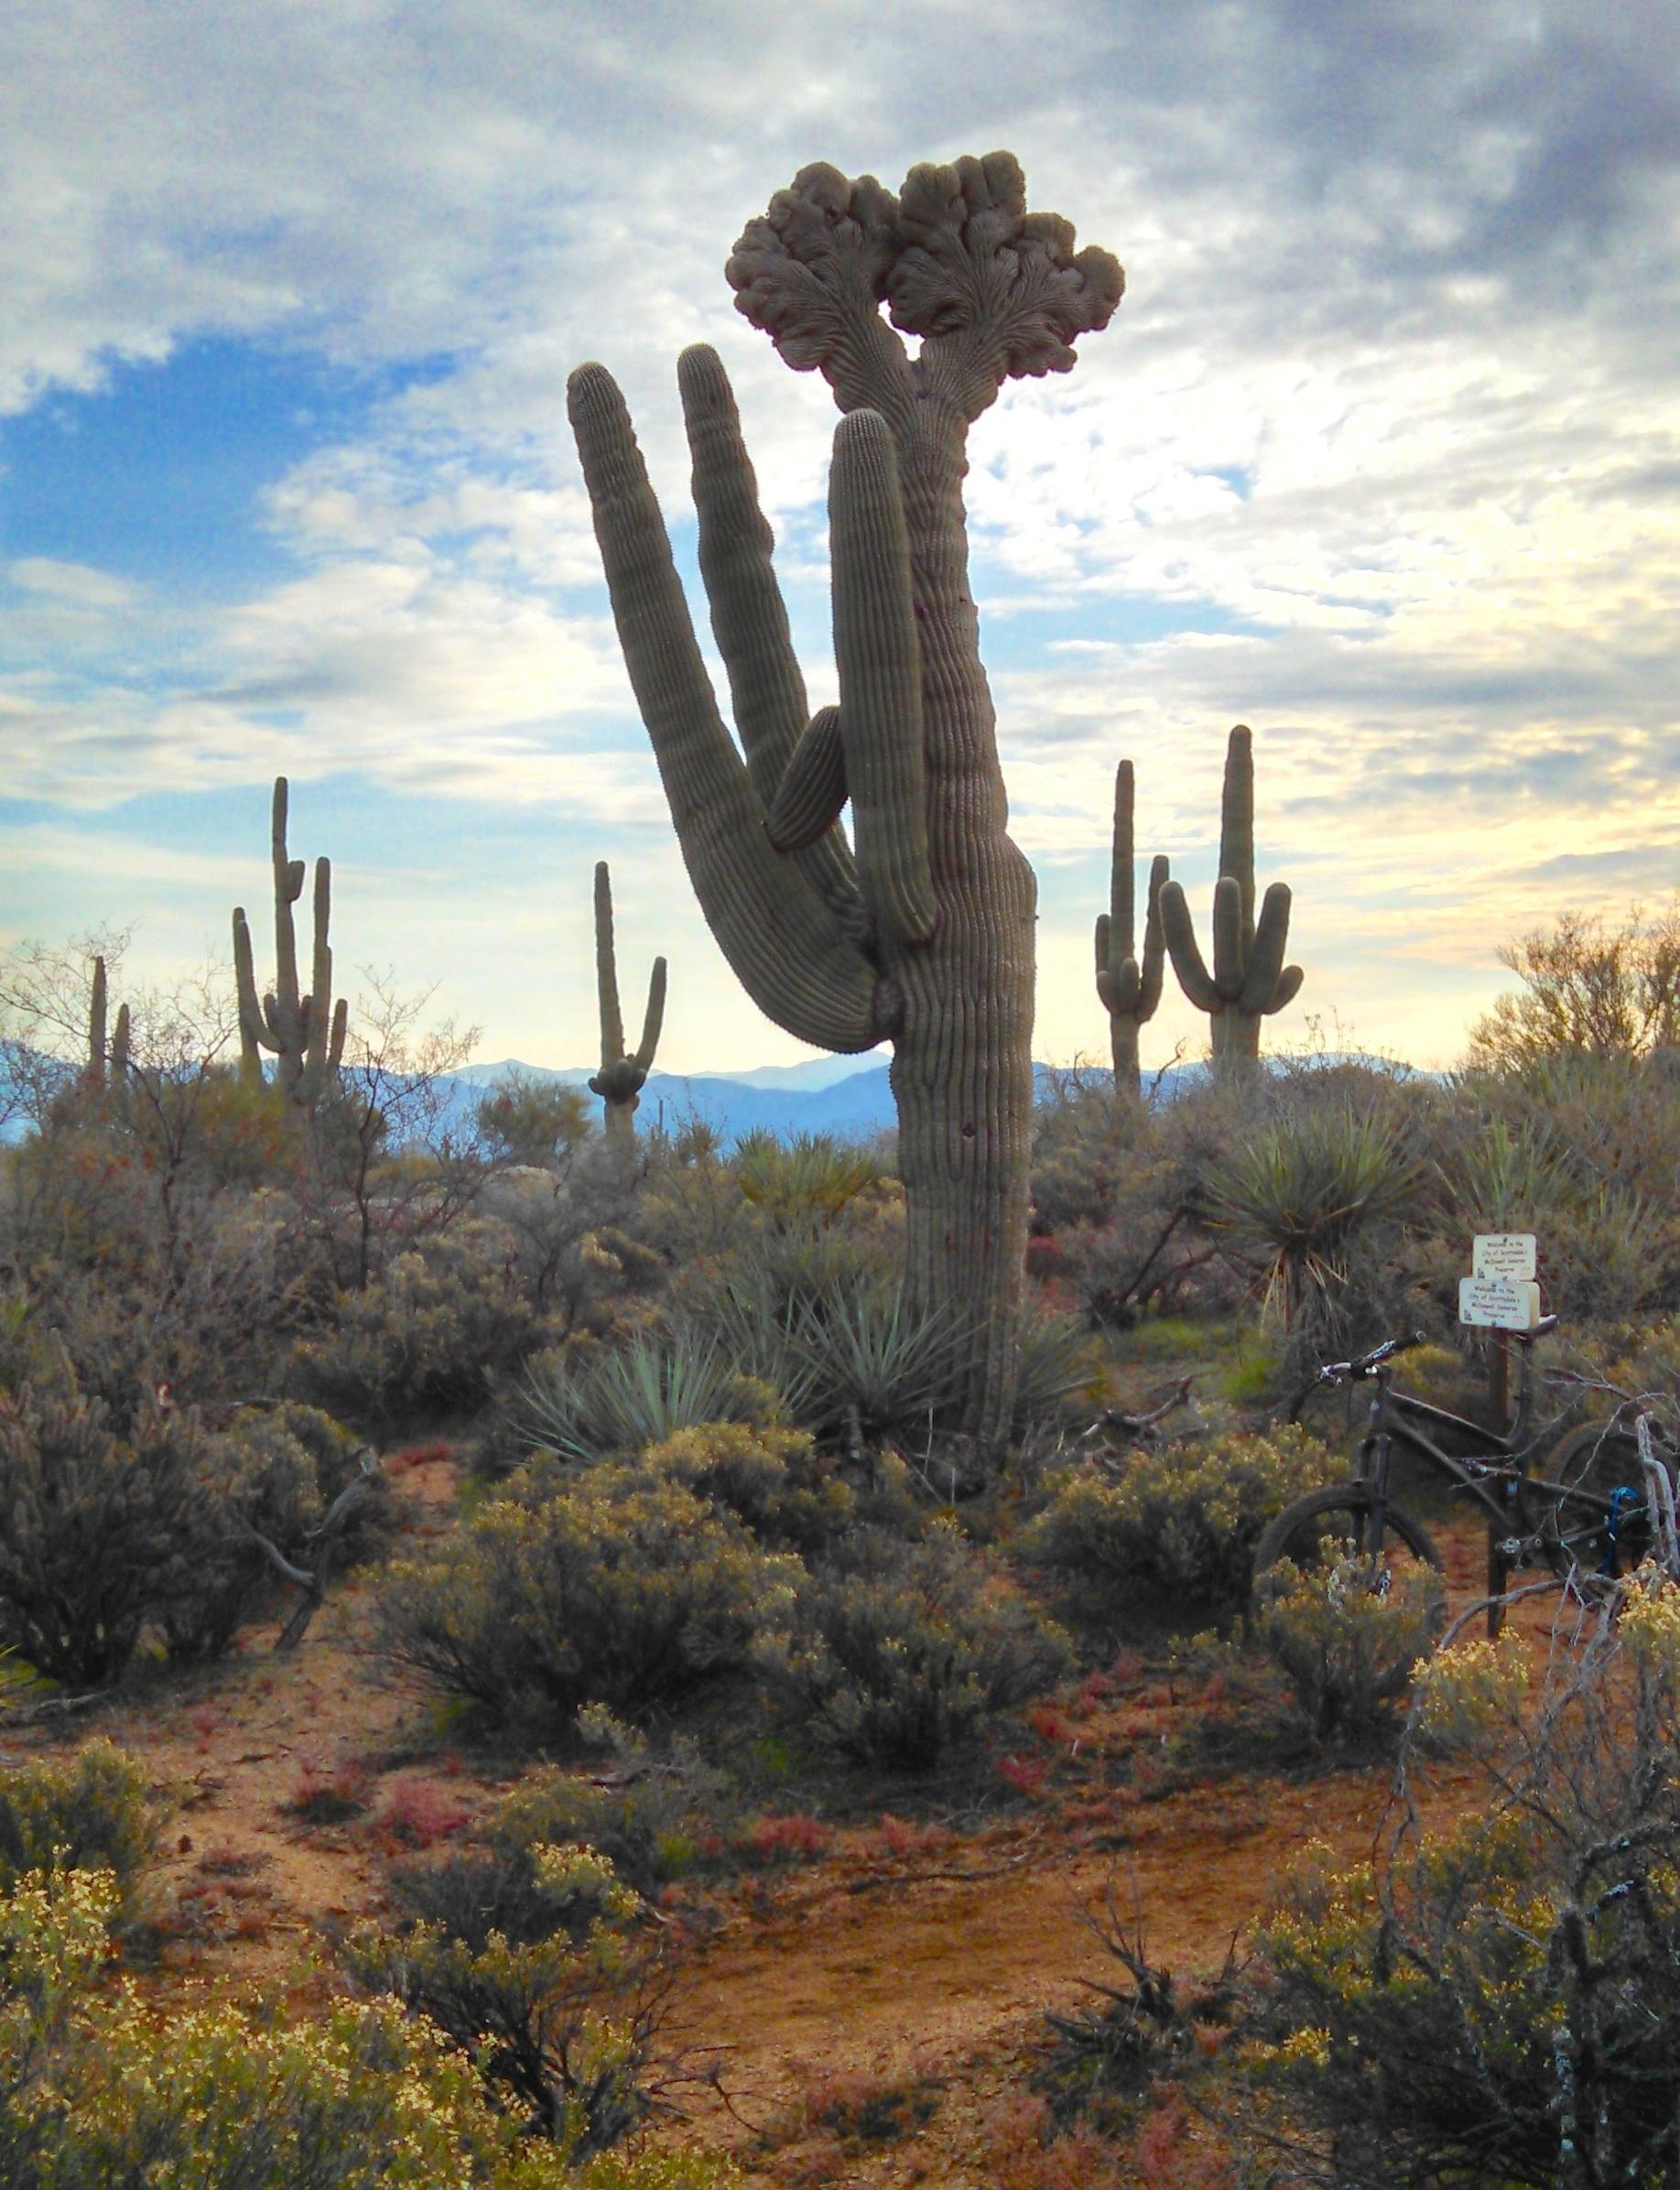 Free Images : landscape, tree, nature, cactus, desert ...